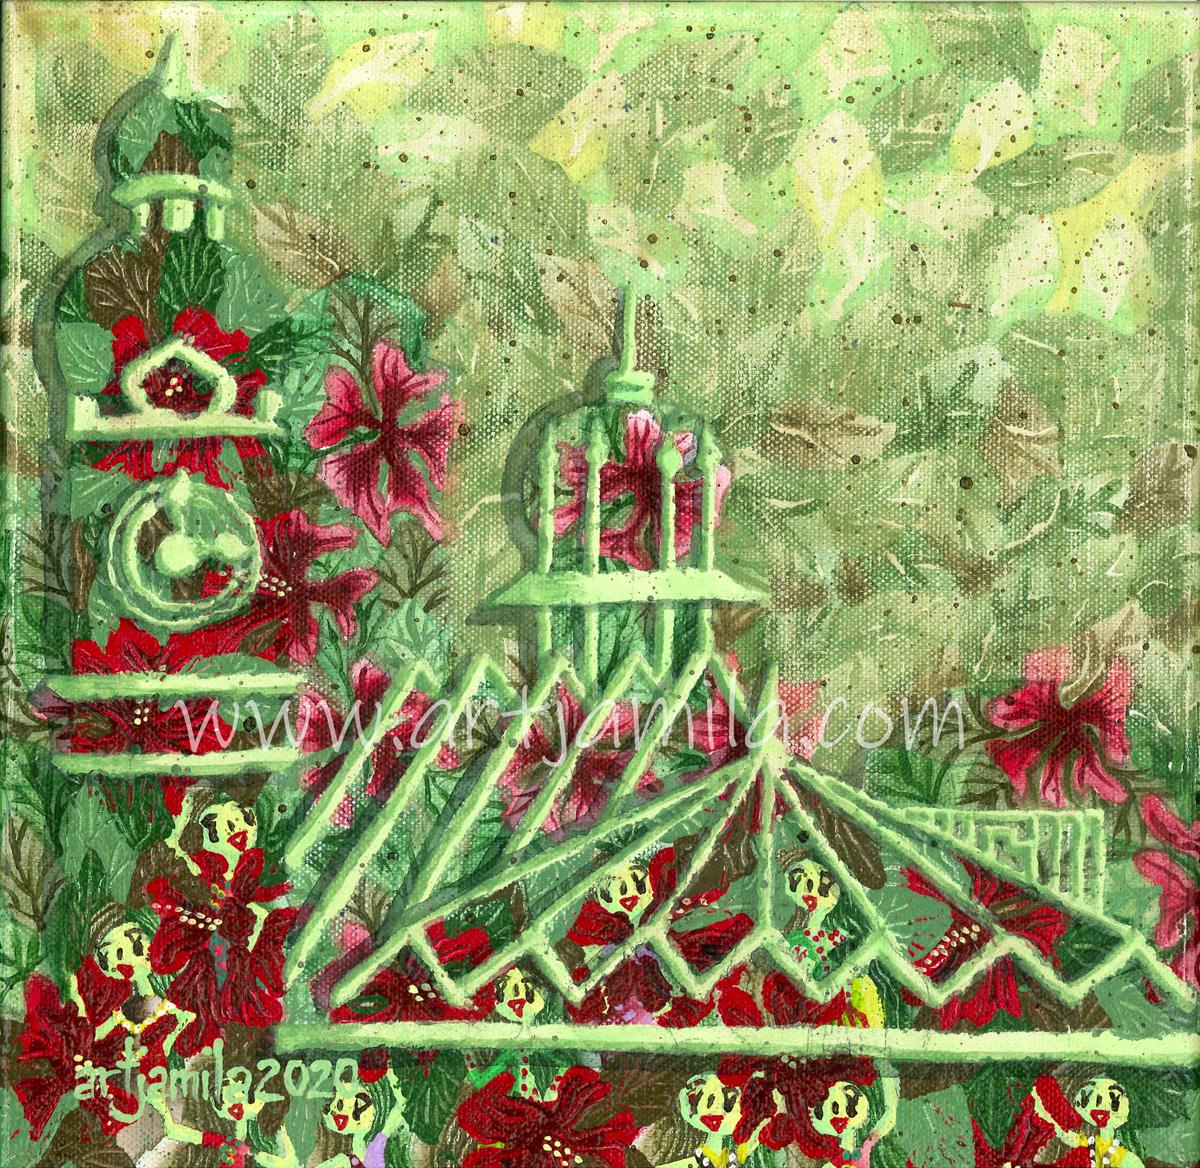 Green Cities Series 8B KL Heritage (1x1)watermark